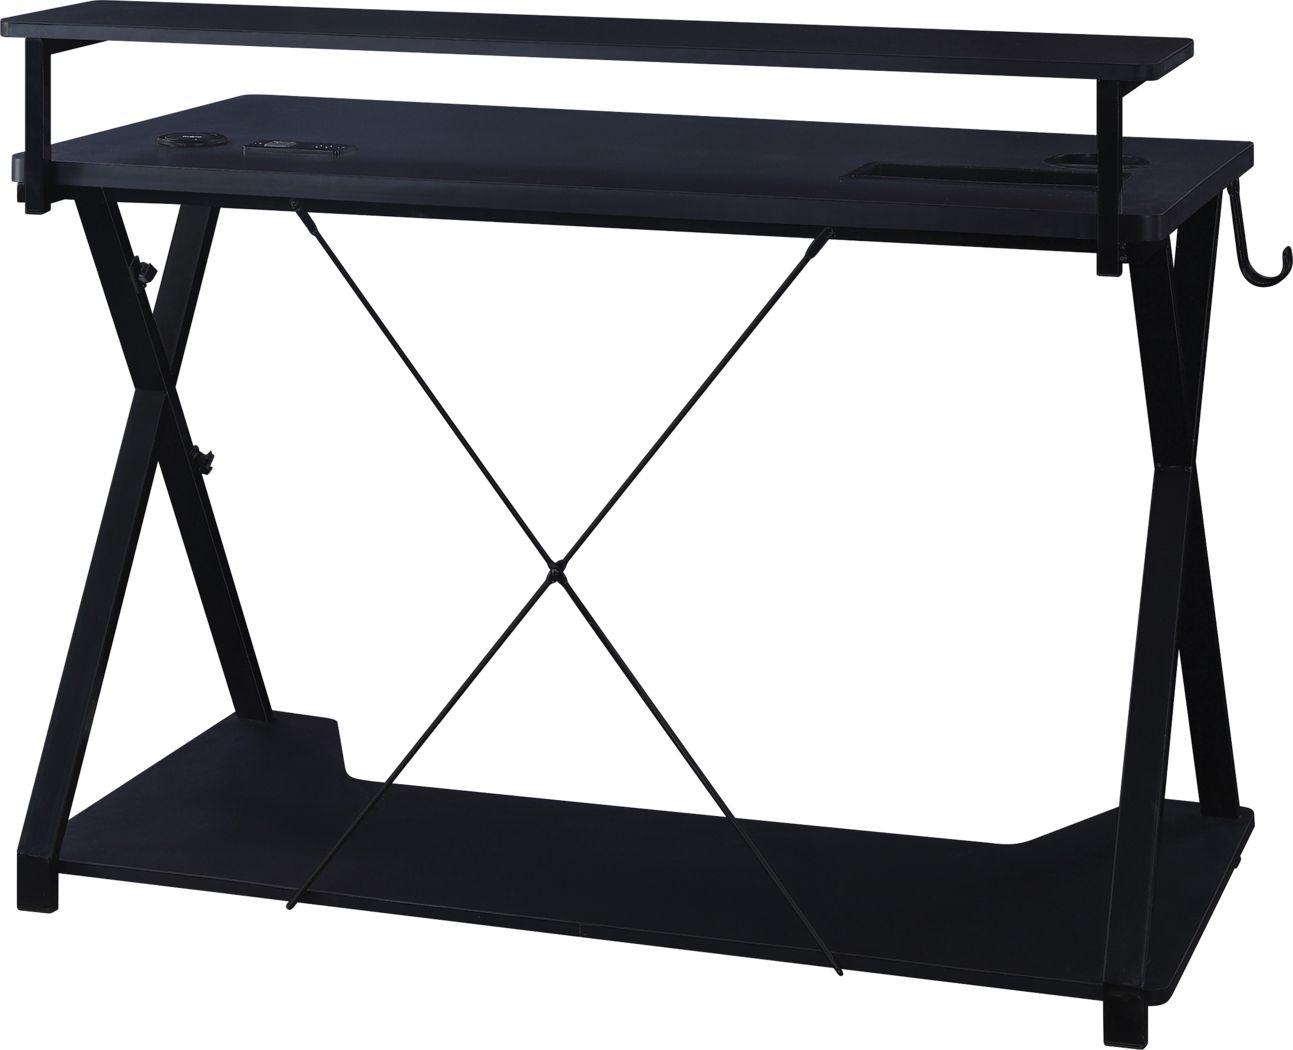 Axyon Black Gaming Desk